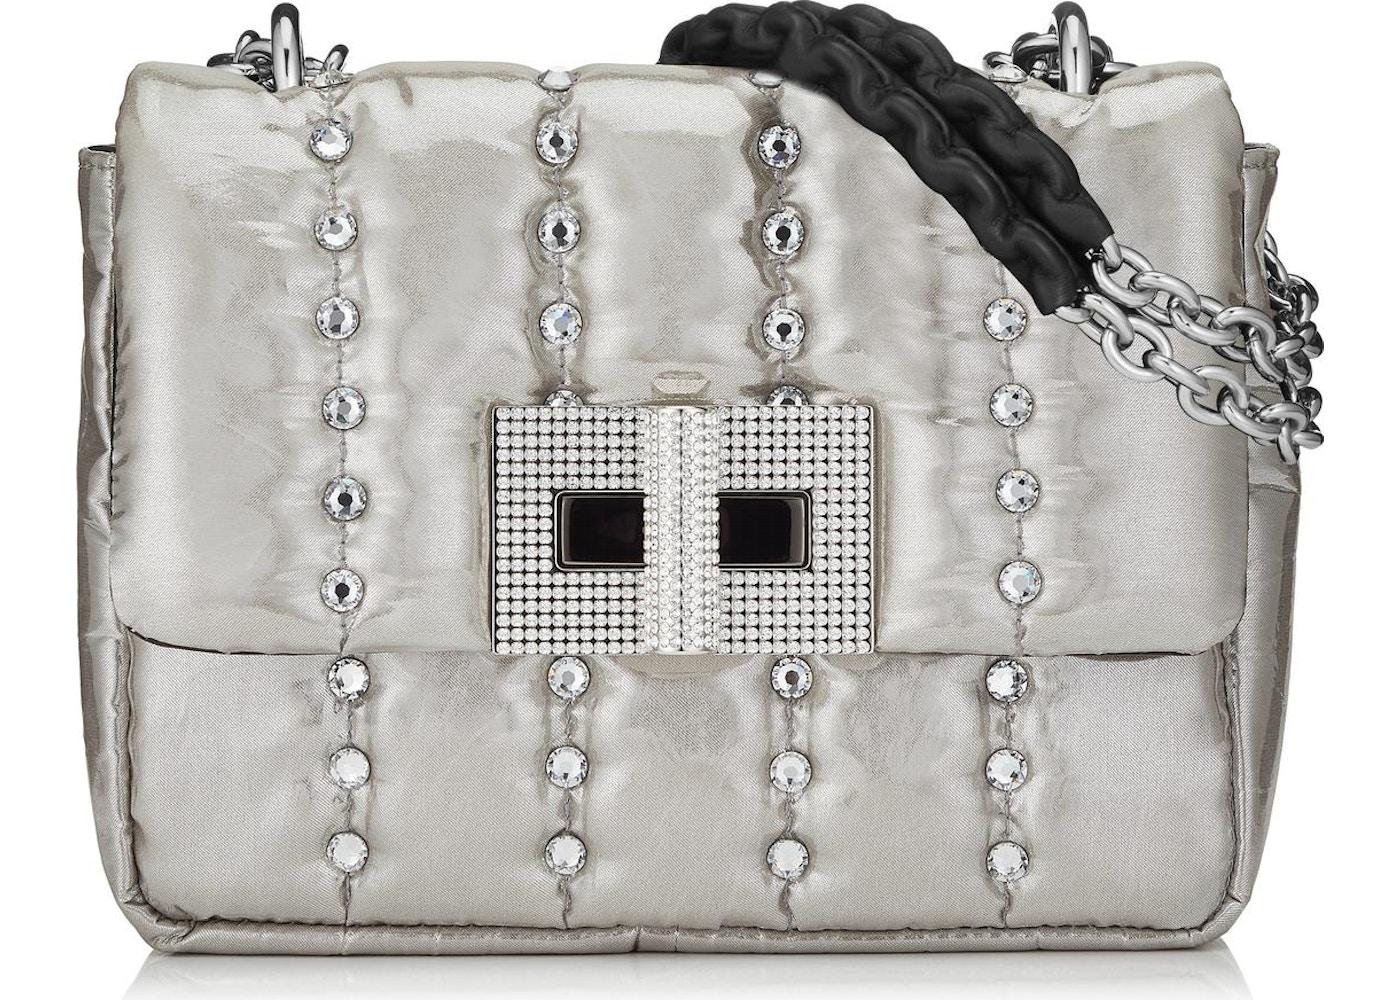 c738a35d2 Tom Ford Natalia Shoulder Bag Disco Quilted Crystal Small Silver. Disco  Quilted Crystal Small Silver